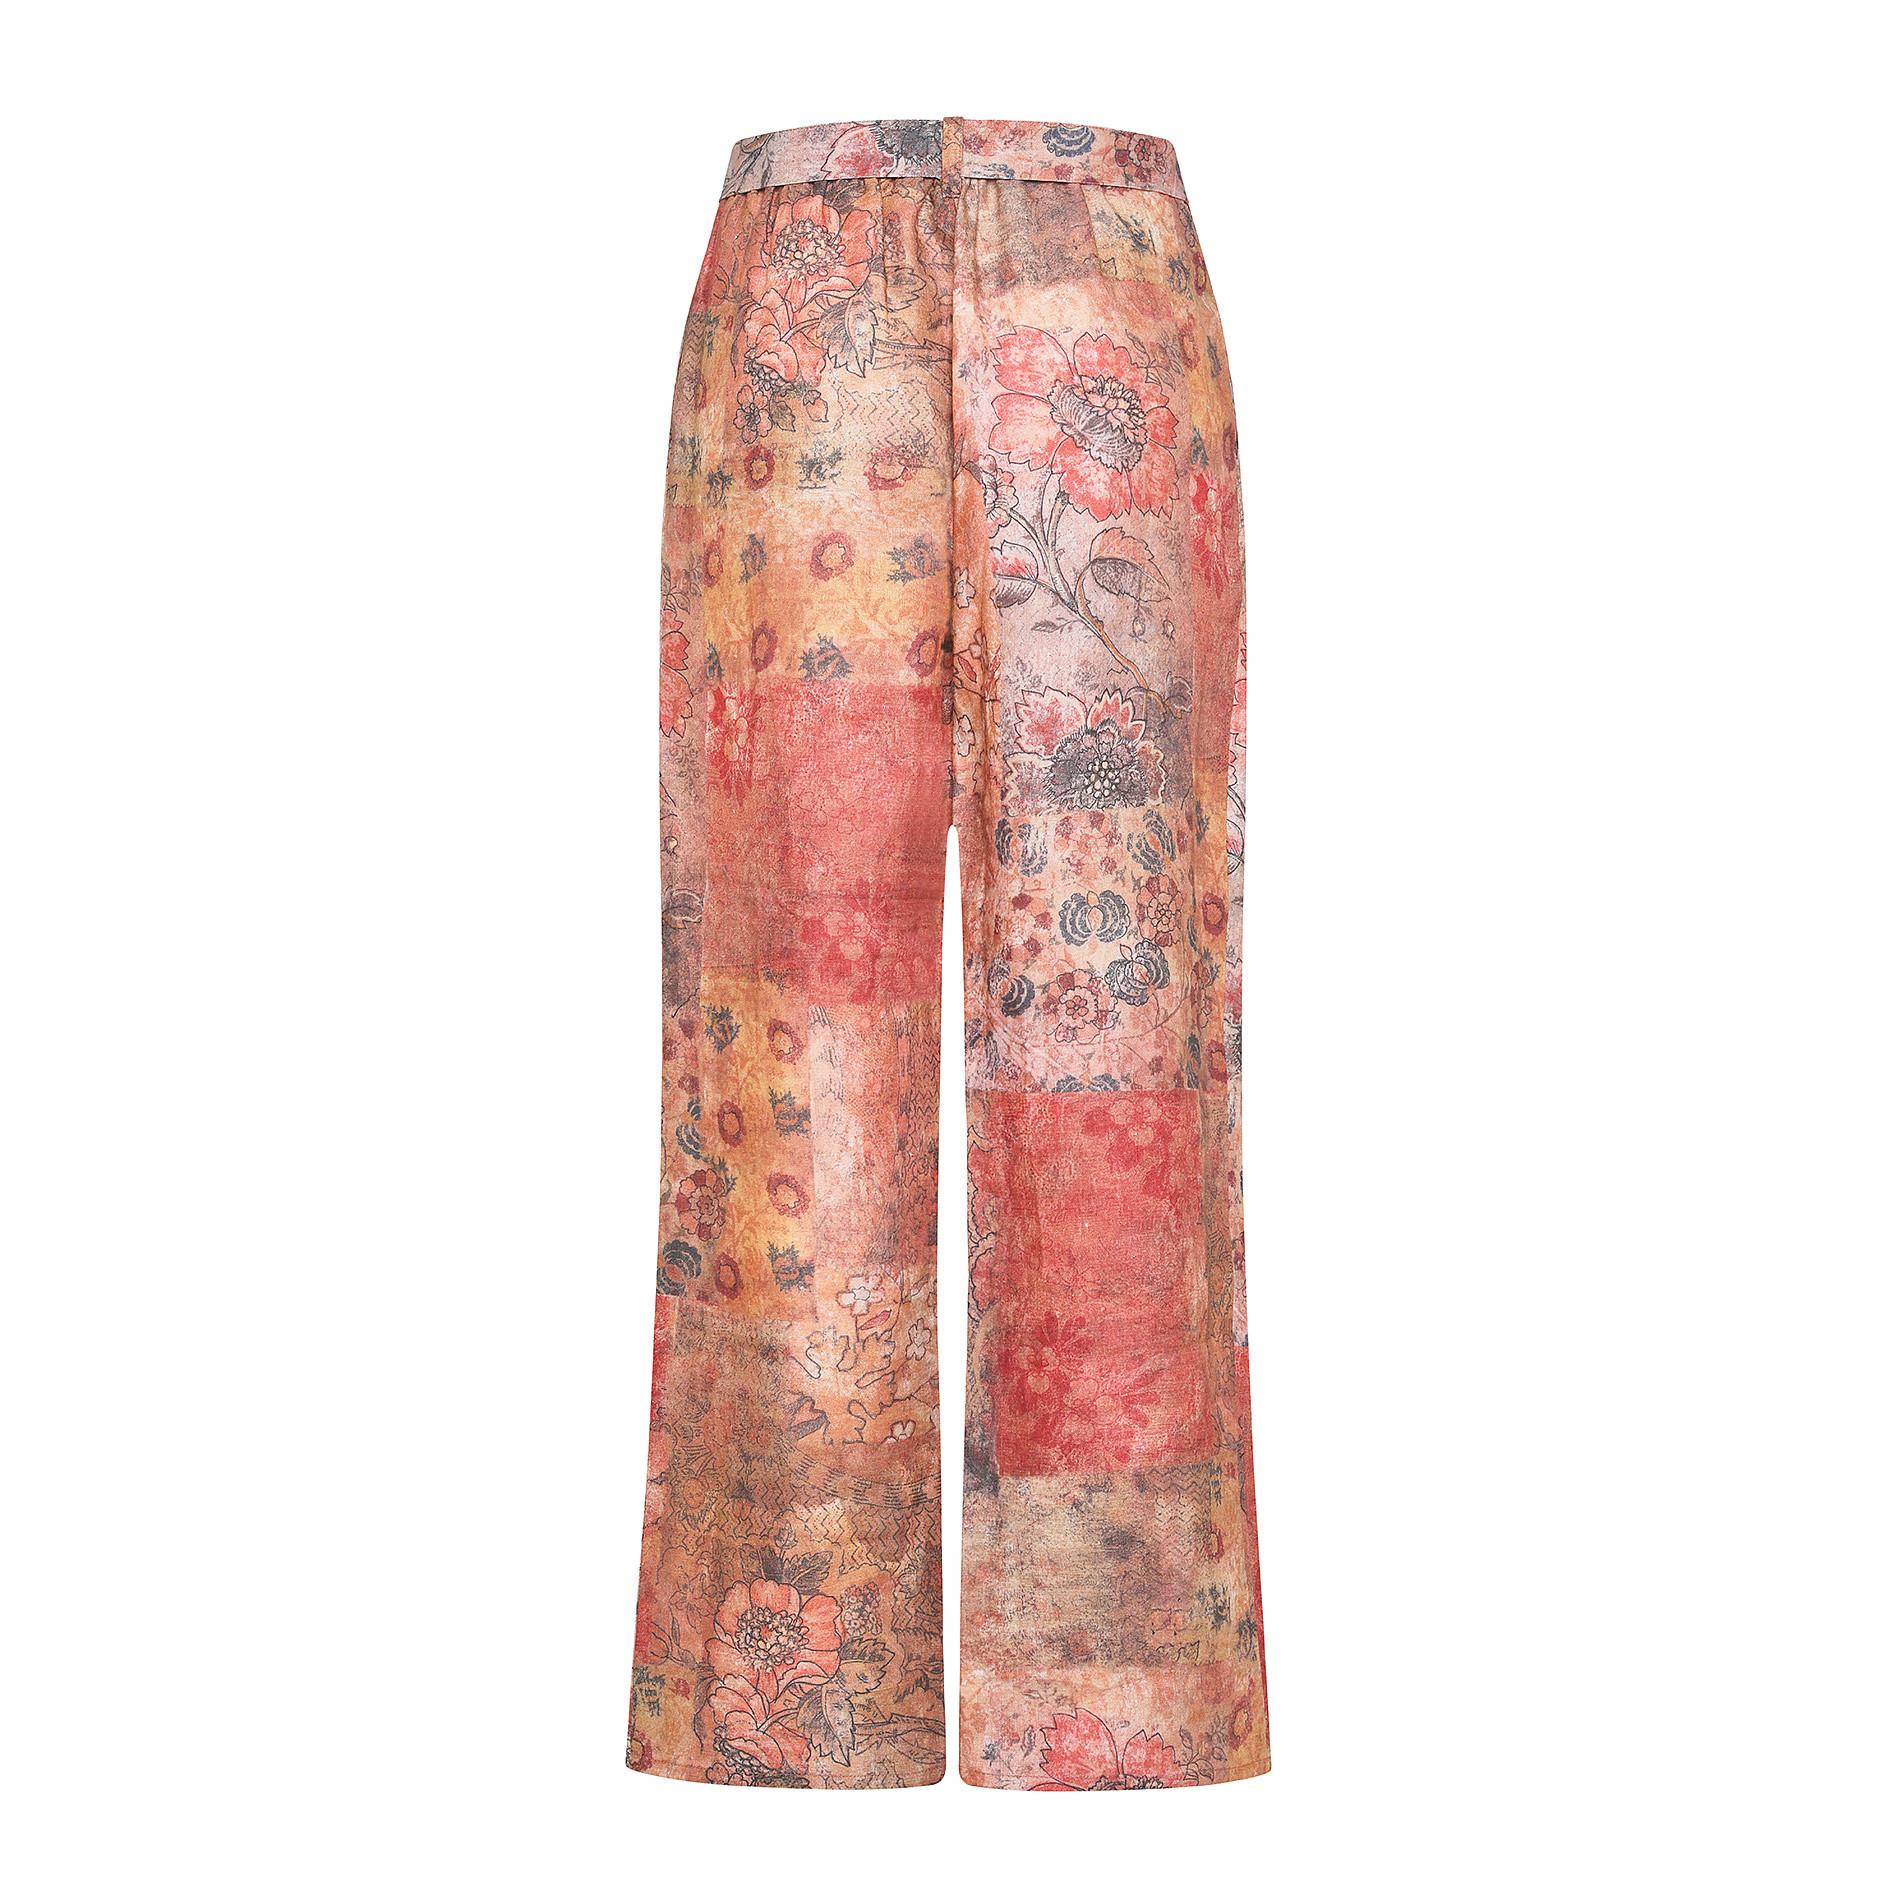 Pantalone morbido in puro lino fantasia floreale, Multicolor, large image number 1